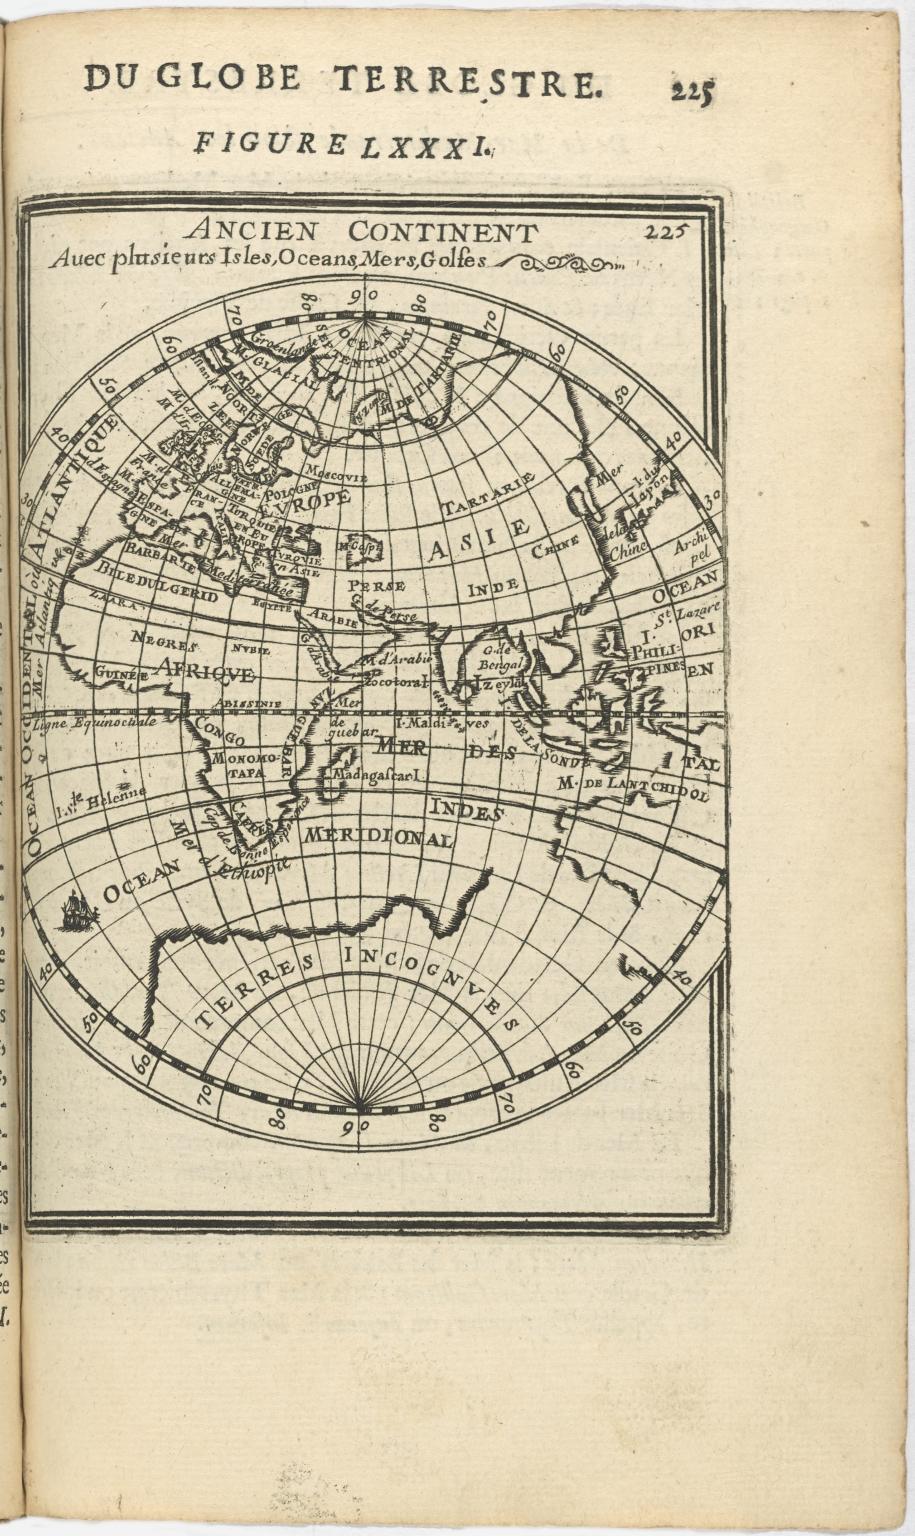 Ancien Continent Avec plusieurs Isles, Oceans, Mers, Golfes